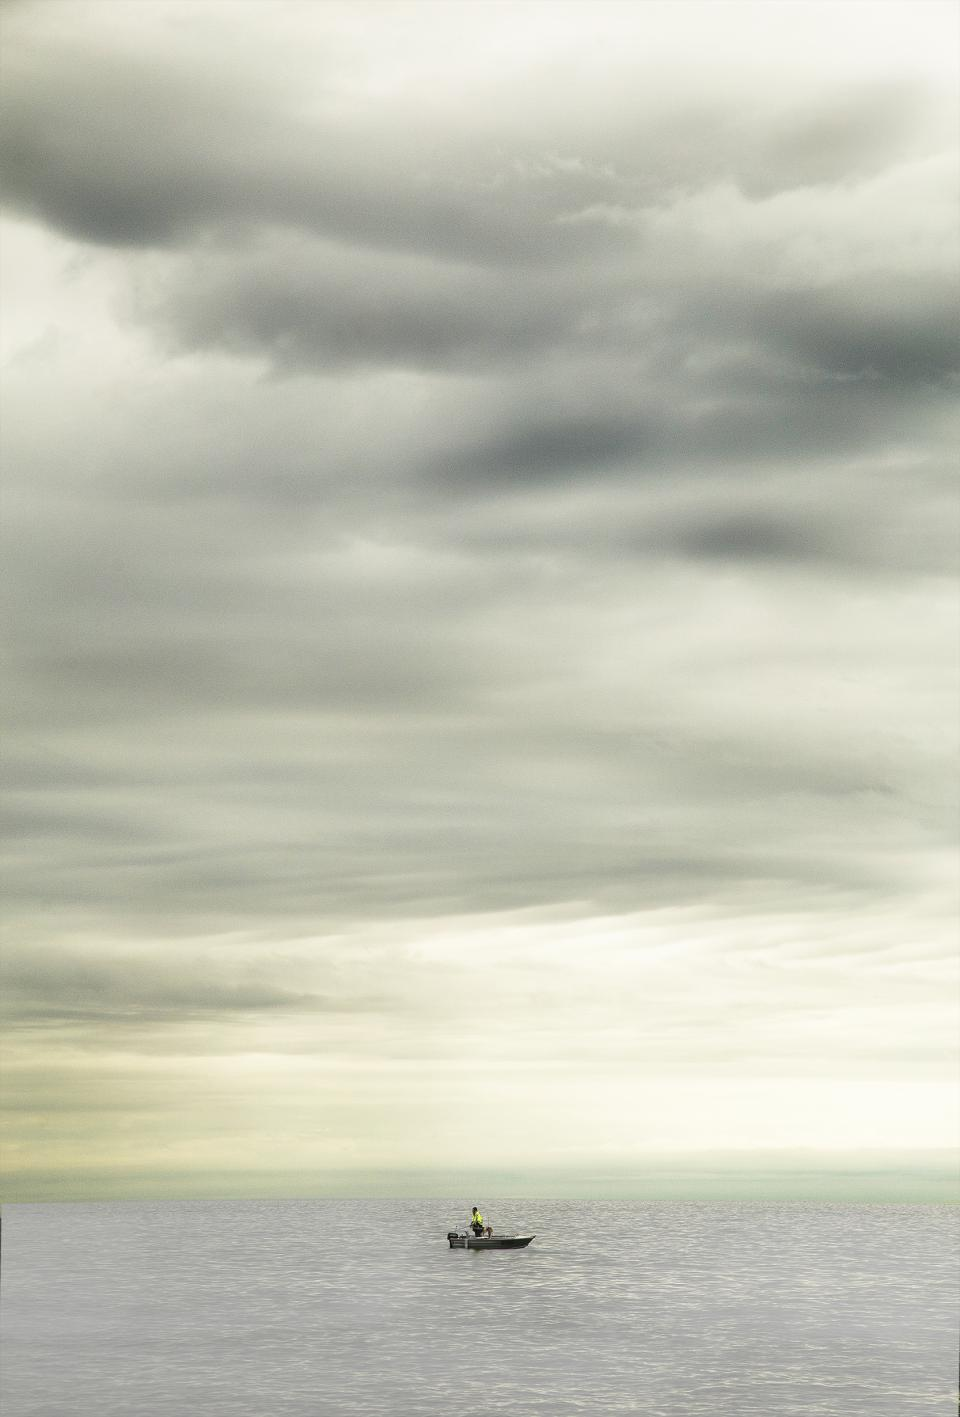 boat, ocean, sea, water, horizon, outdoors, sky, clouds, cloudy, storm, nature